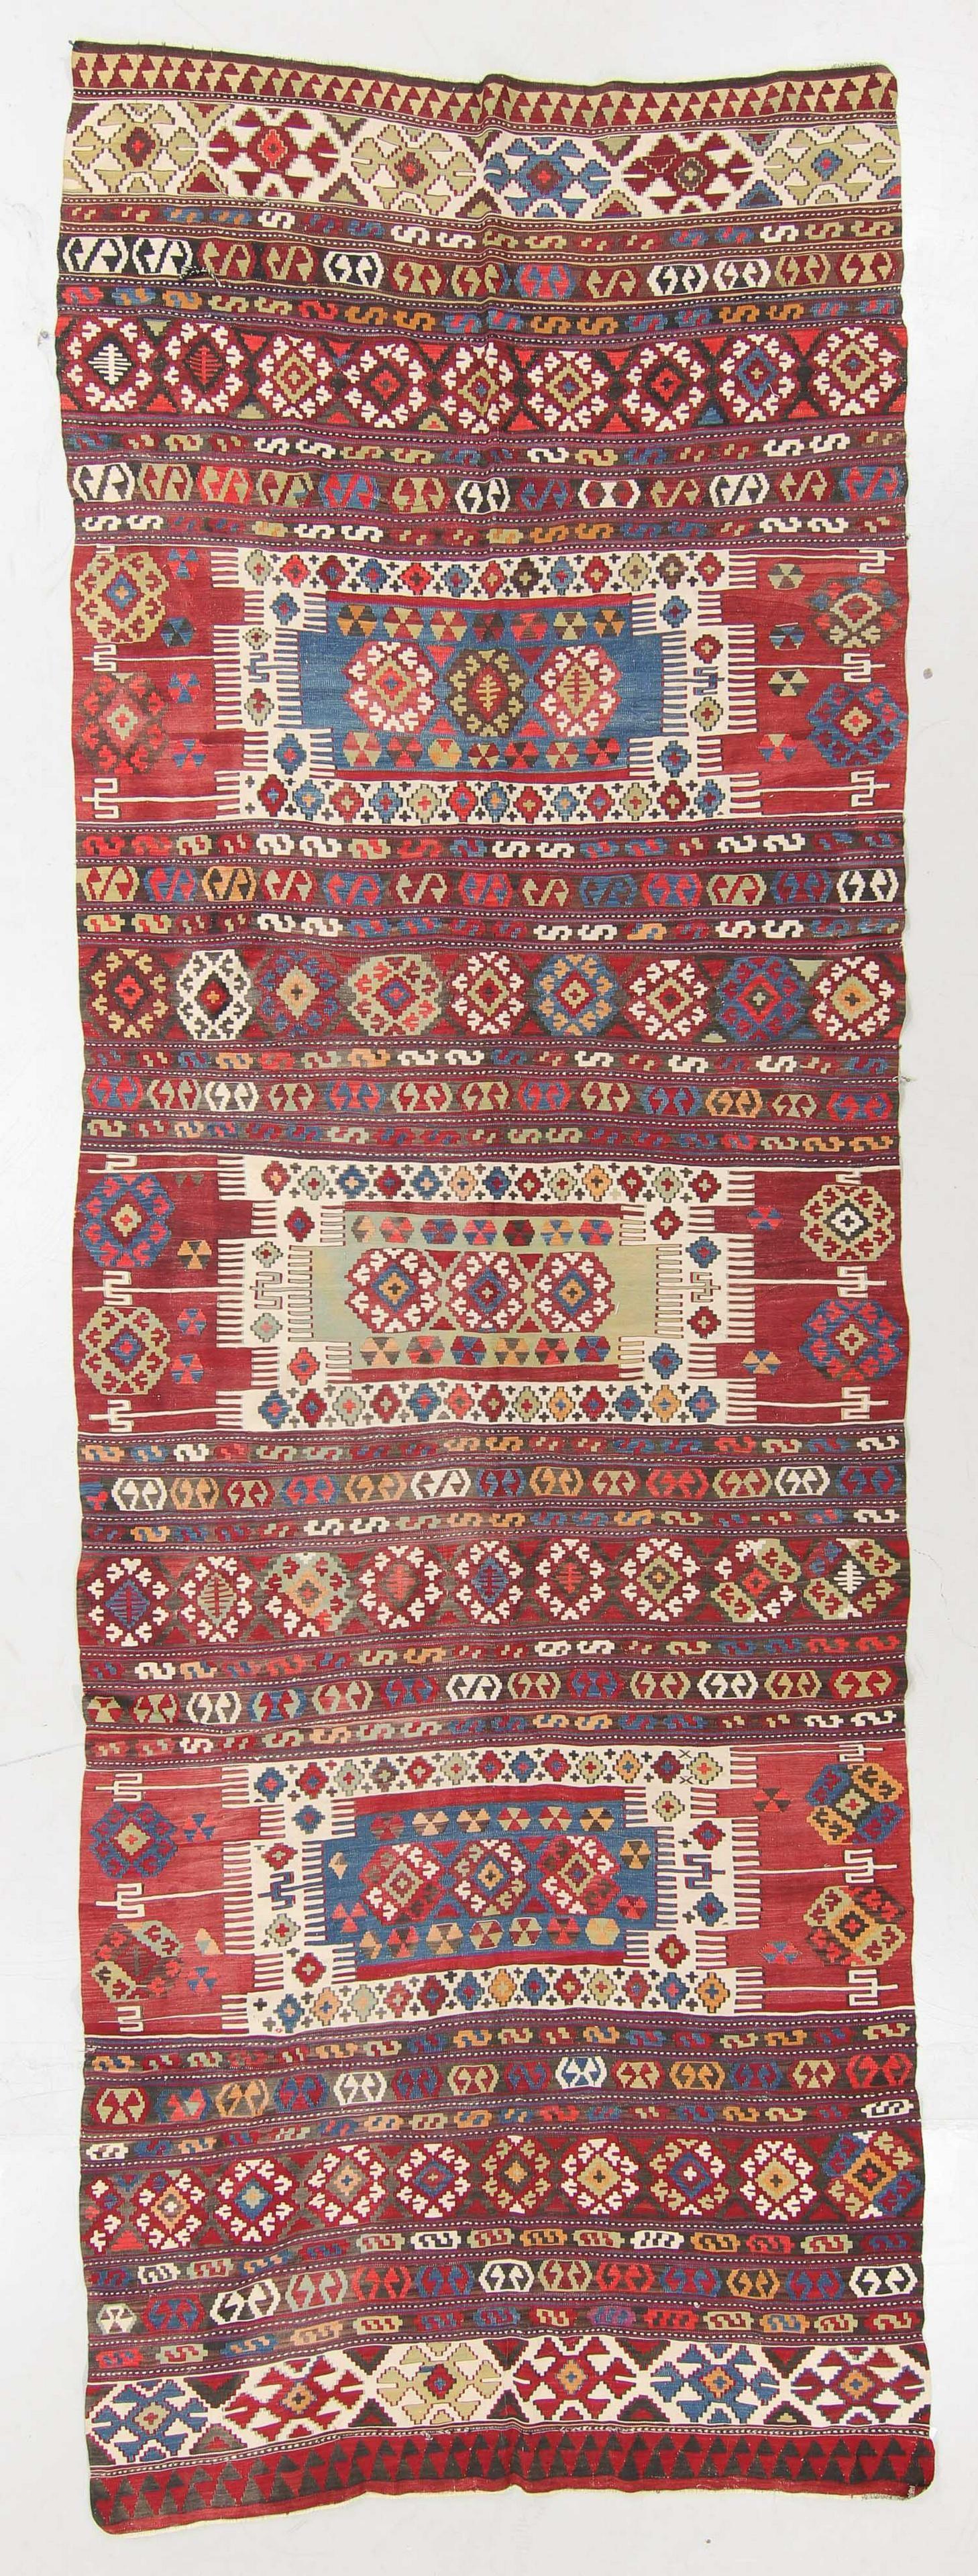 Antique Central Anatolian Kilim, Turkey: 5'5'' x 16'2''